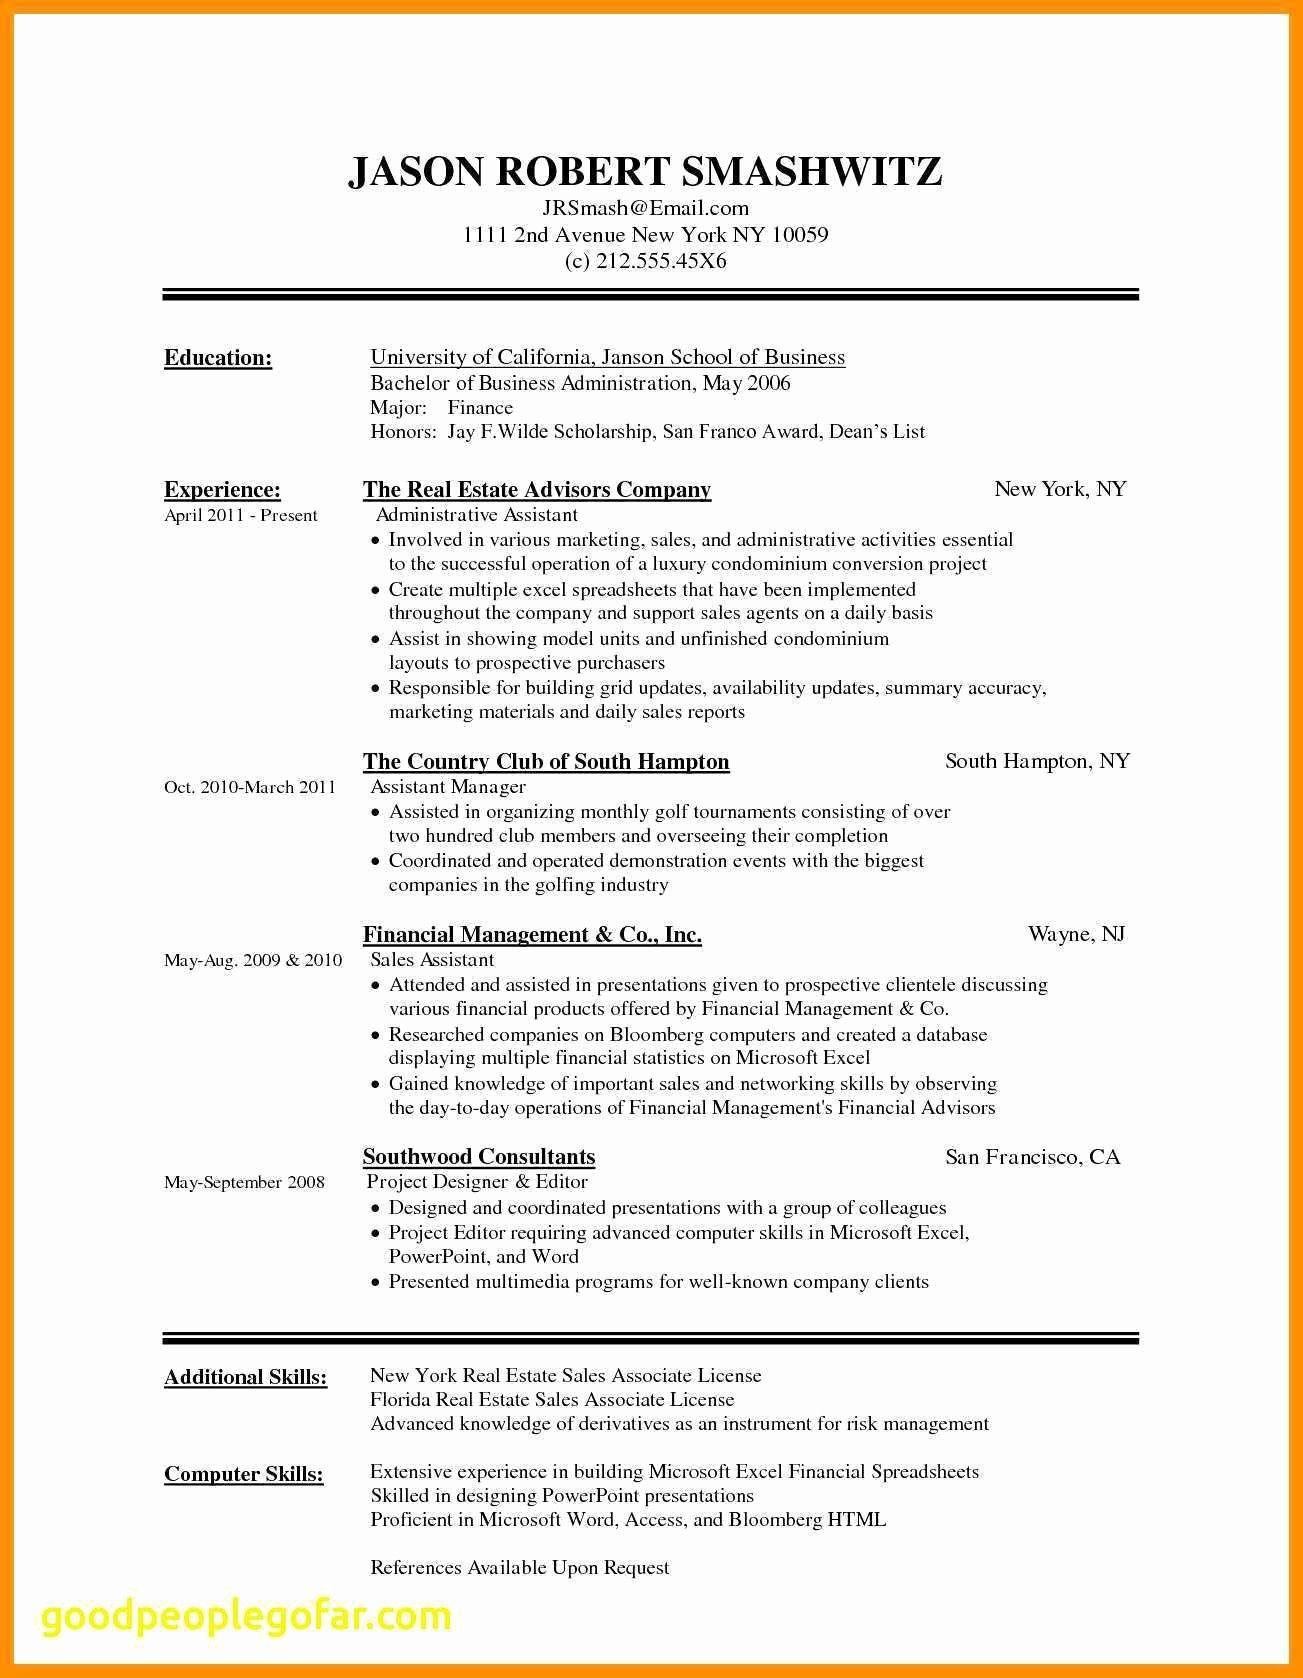 Curriculum Vitae Printable Templates